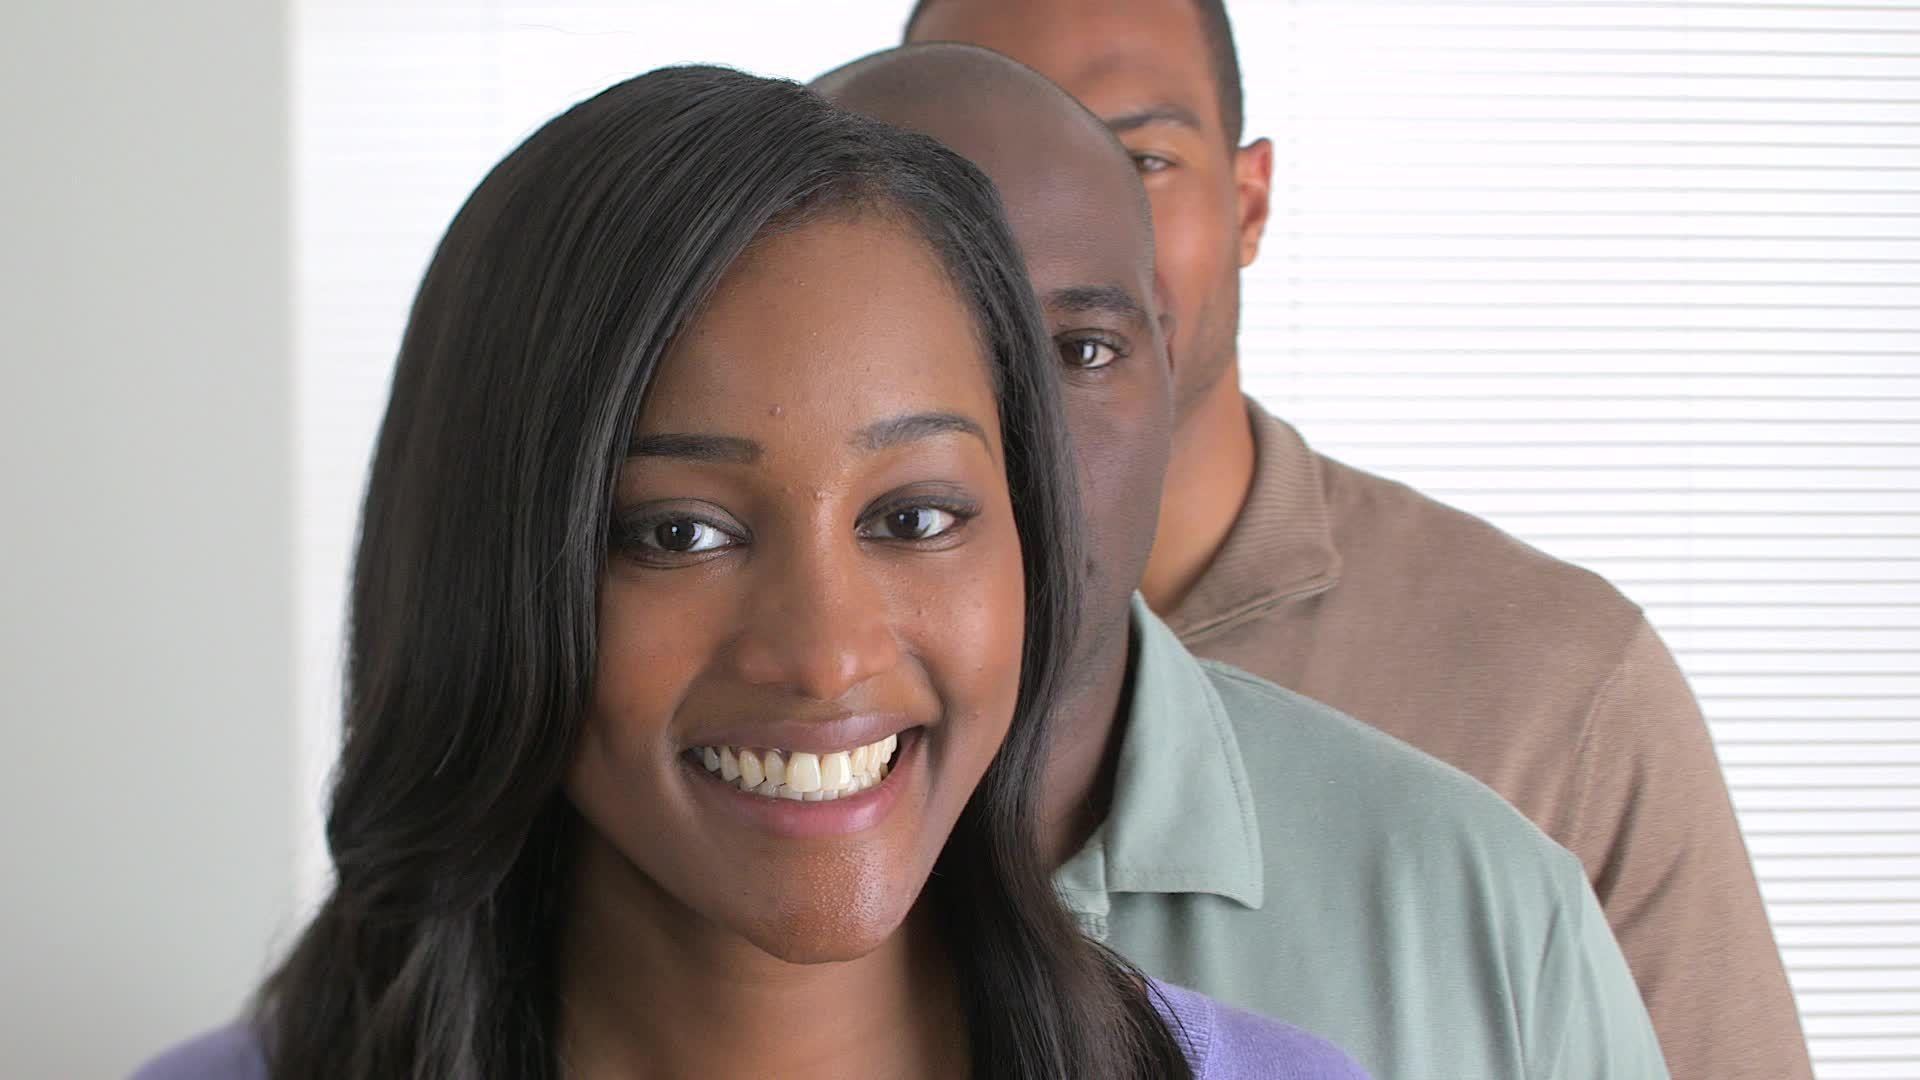 Home design bilder einzigen stock confident black businessteam stock footageblackconfident